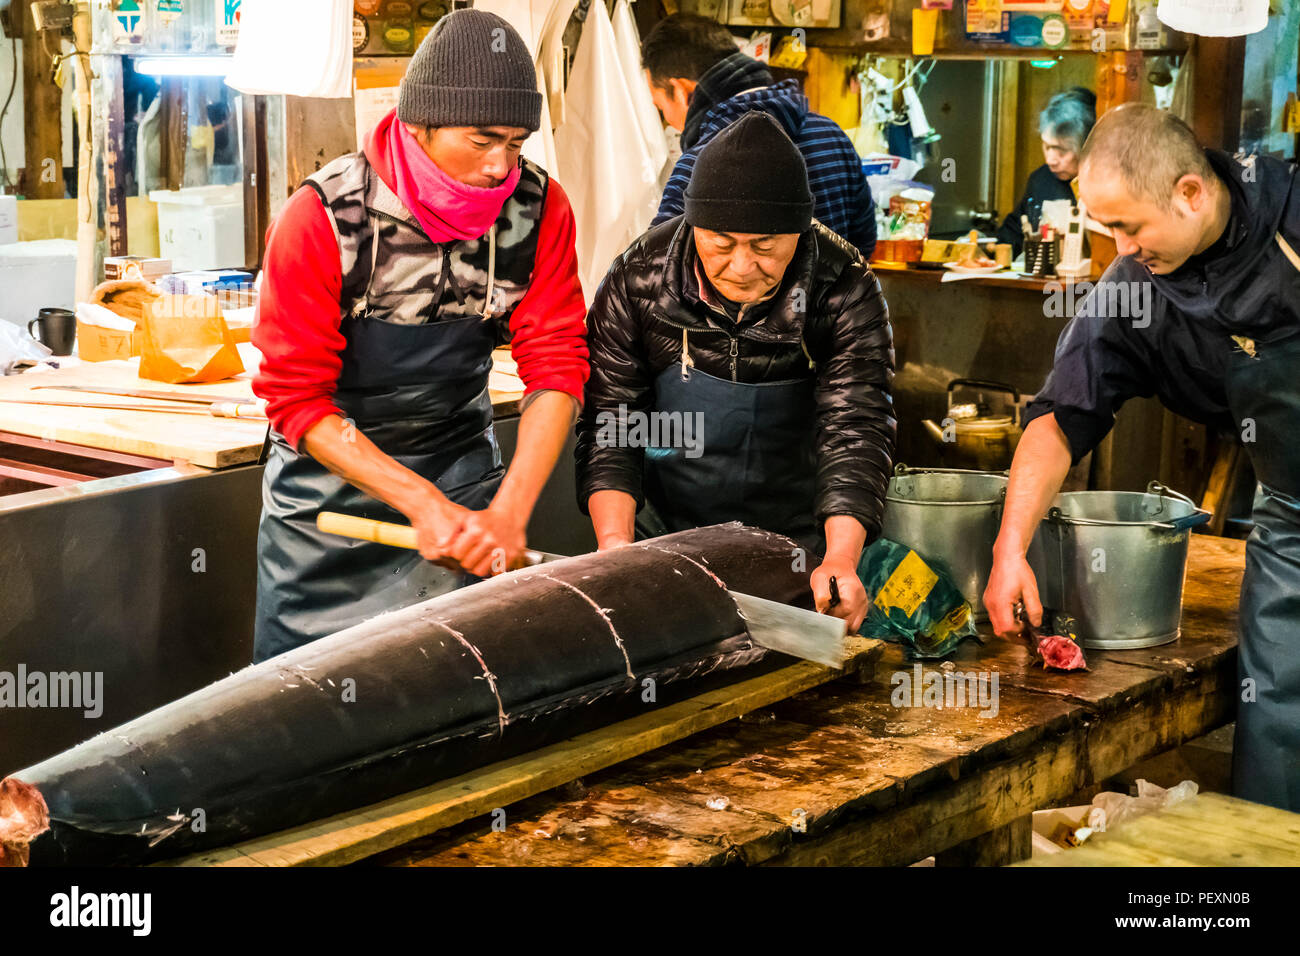 Mercado de Pescado de Tsukiji en Tokio, Japón Imagen De Stock